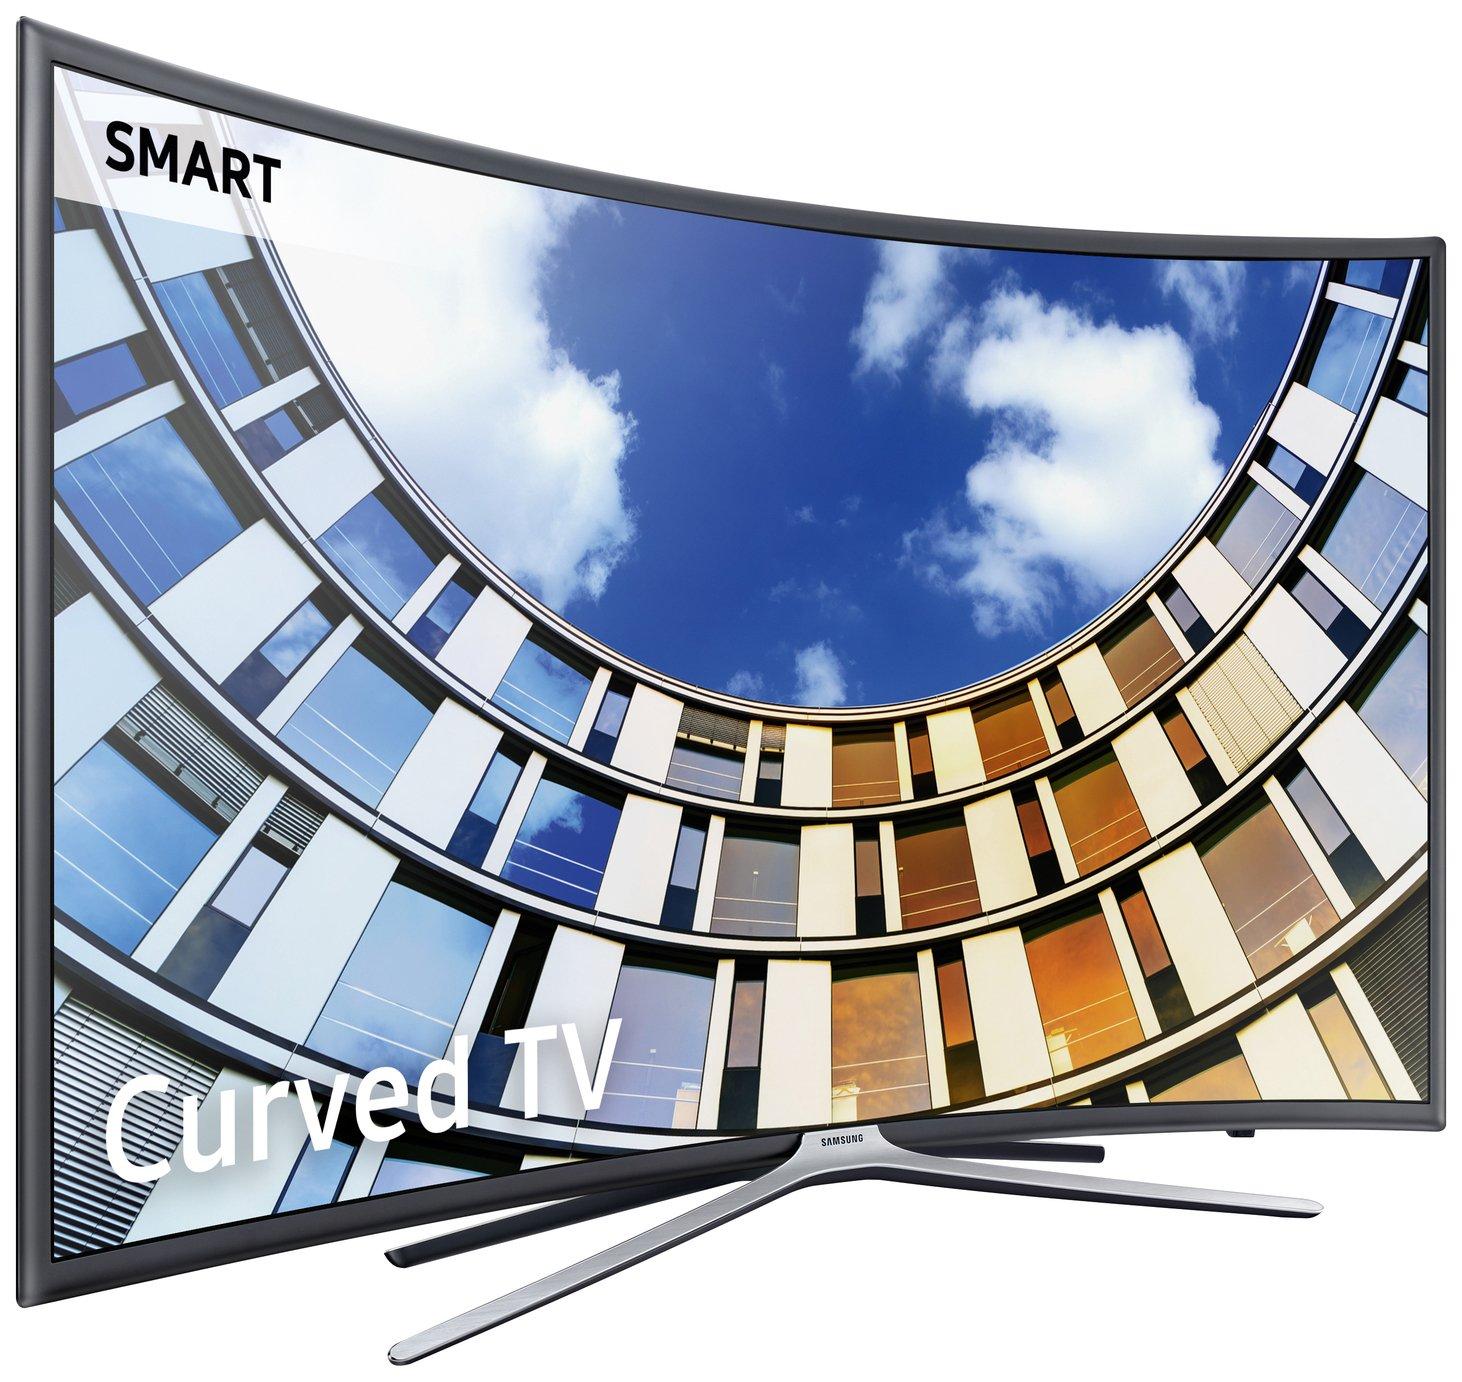 Samsung 49M6320 49 Inch Curved Full HD Smart TV